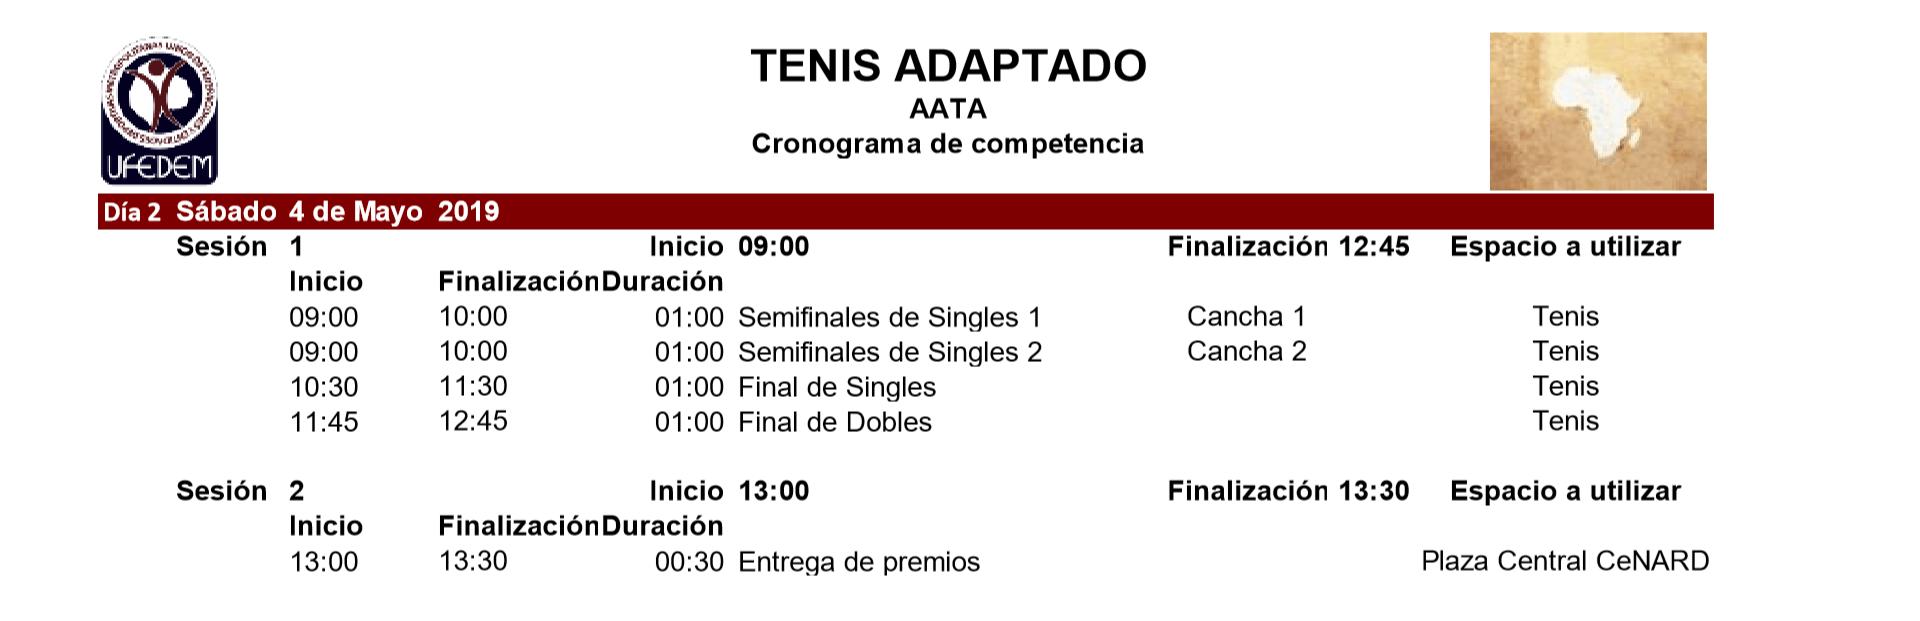 Tenis Adaptado 2.2 - Cronograma